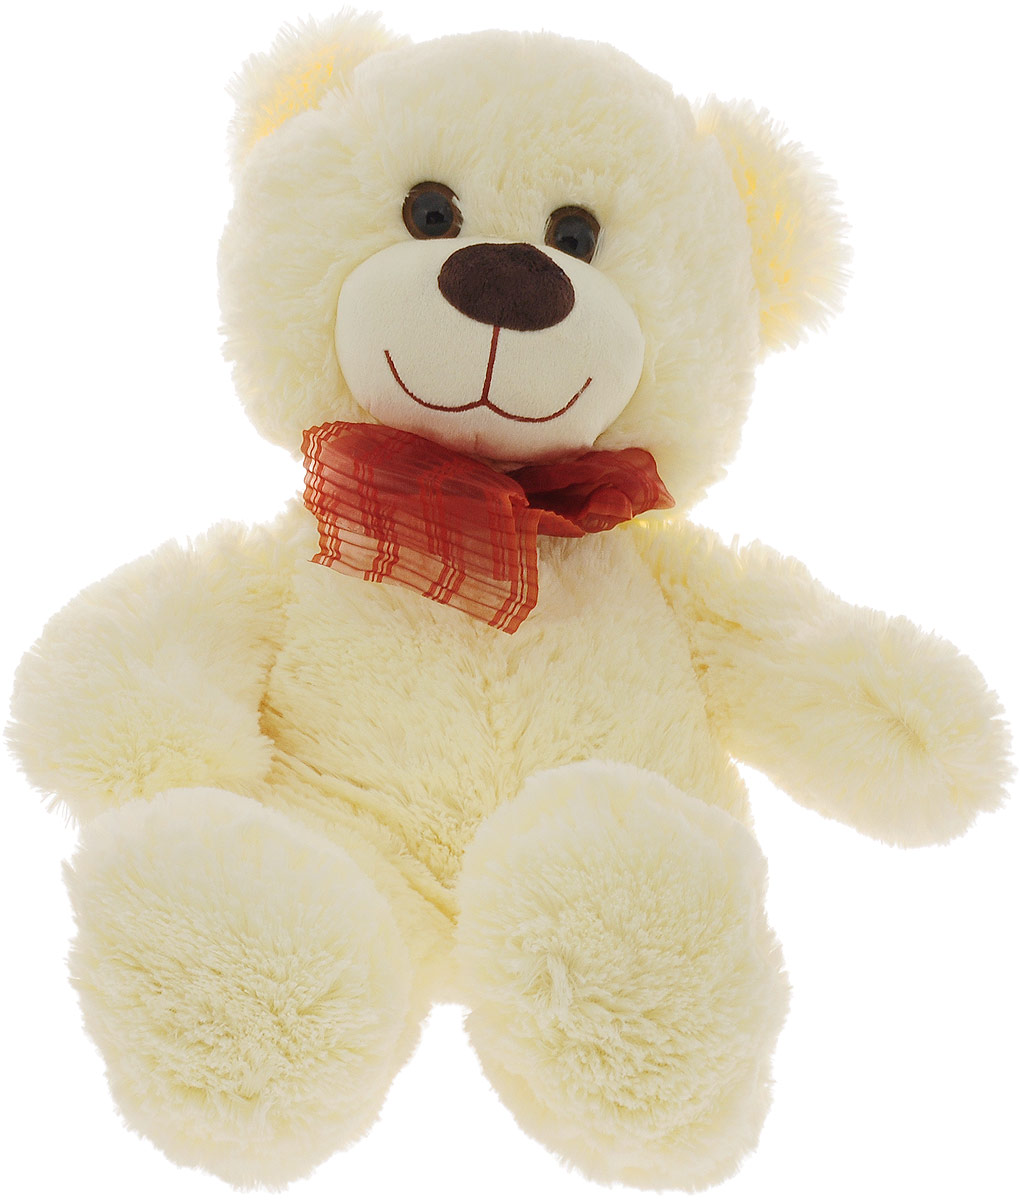 Fancy Мягкая игрушка Медведь Мика 37 см